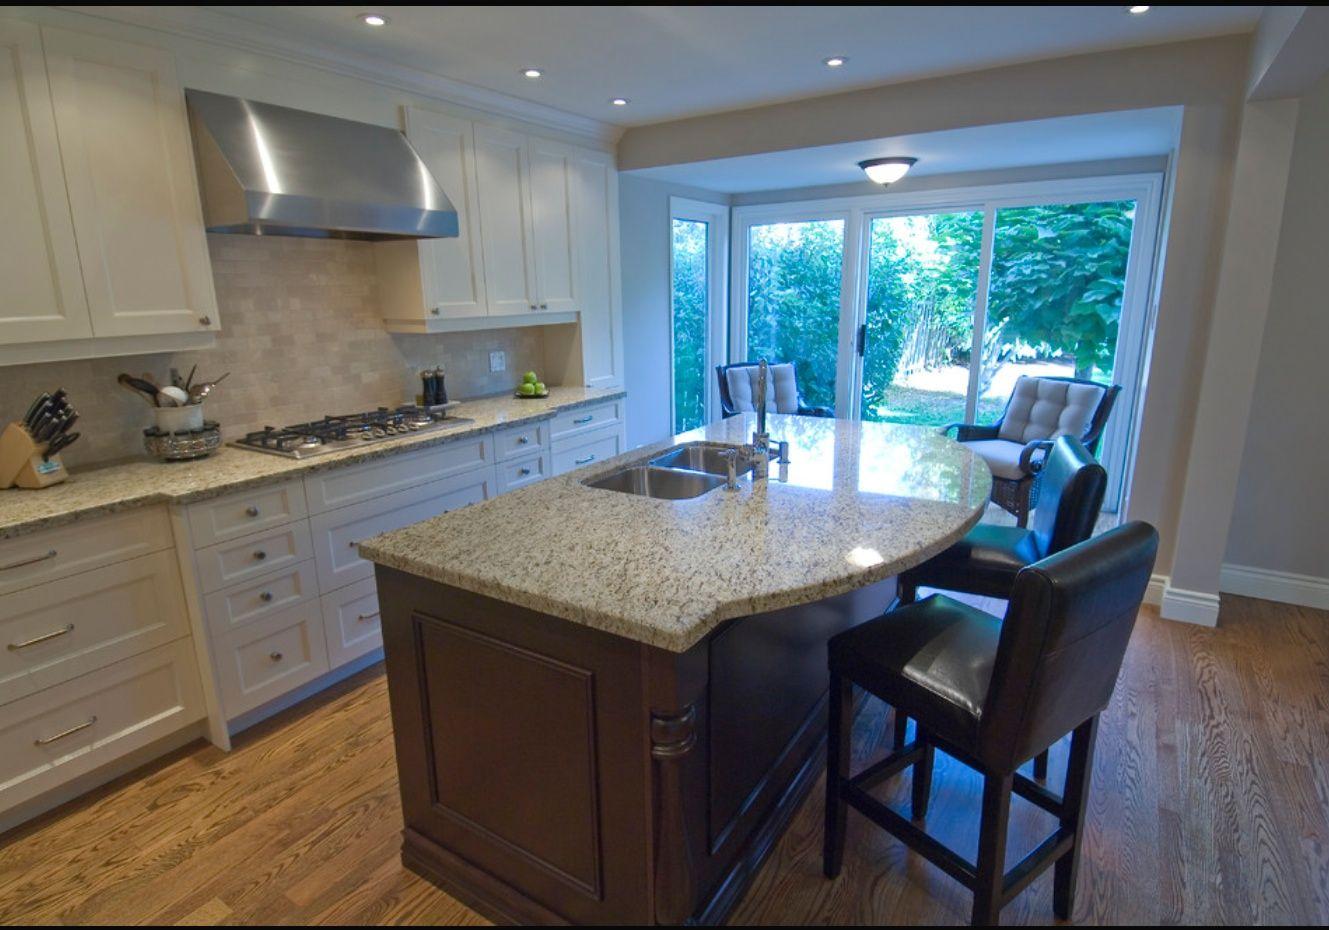 Tumbled Travertine Subway Tile- Giallo Ornamental Granite | Kitchen ...